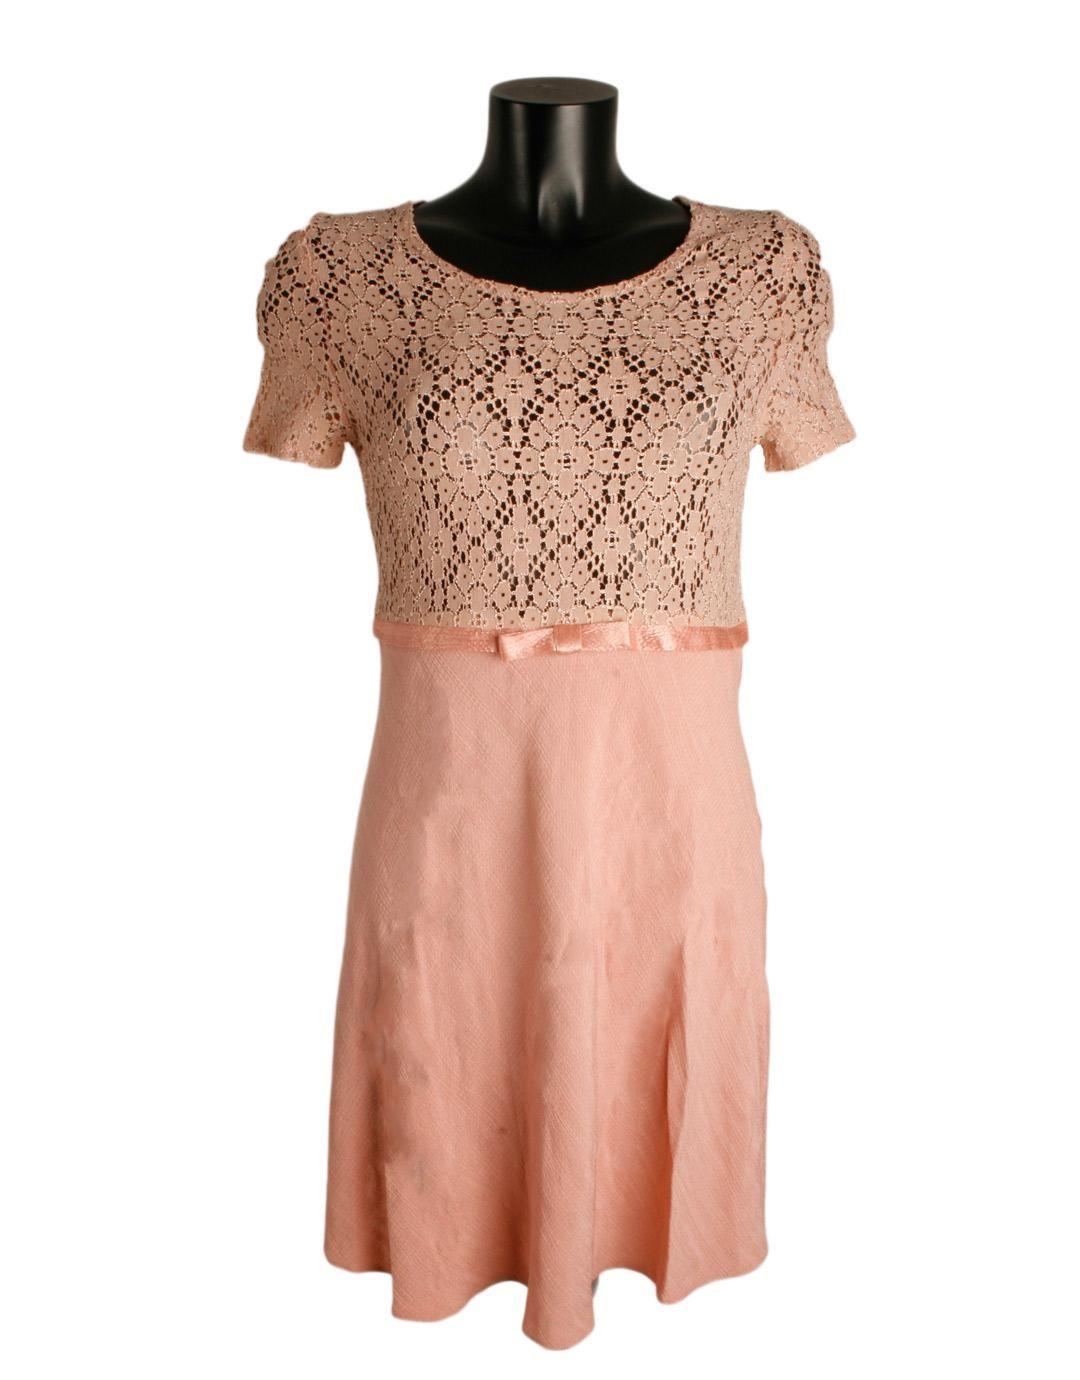 Vestido rosa palo corto el corte ingles